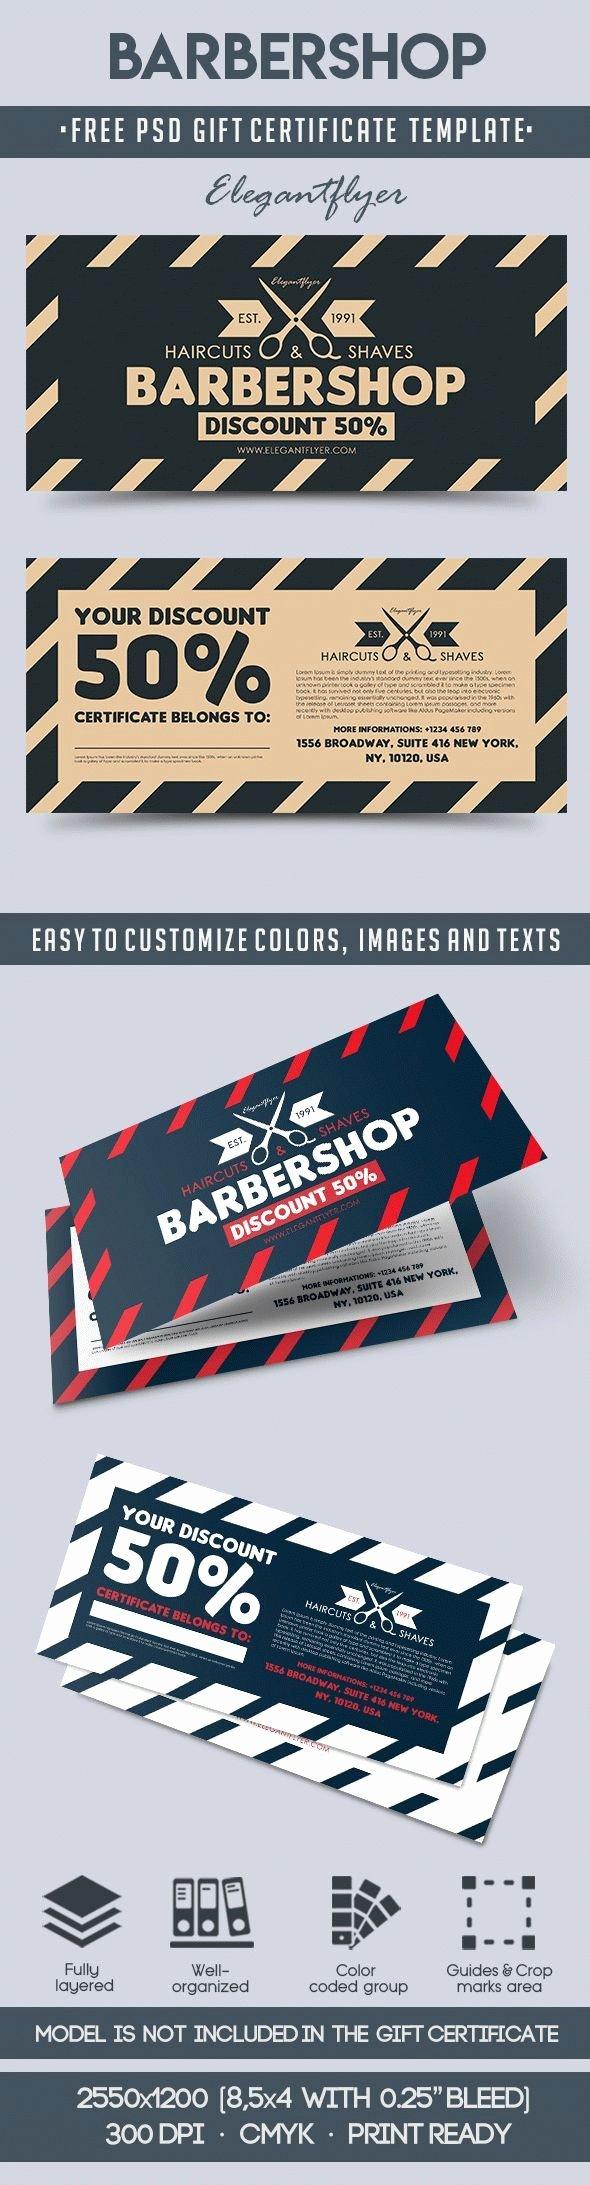 Barber Shop Gift Certificate Template Unique Barber Shop Gift Certificate Template